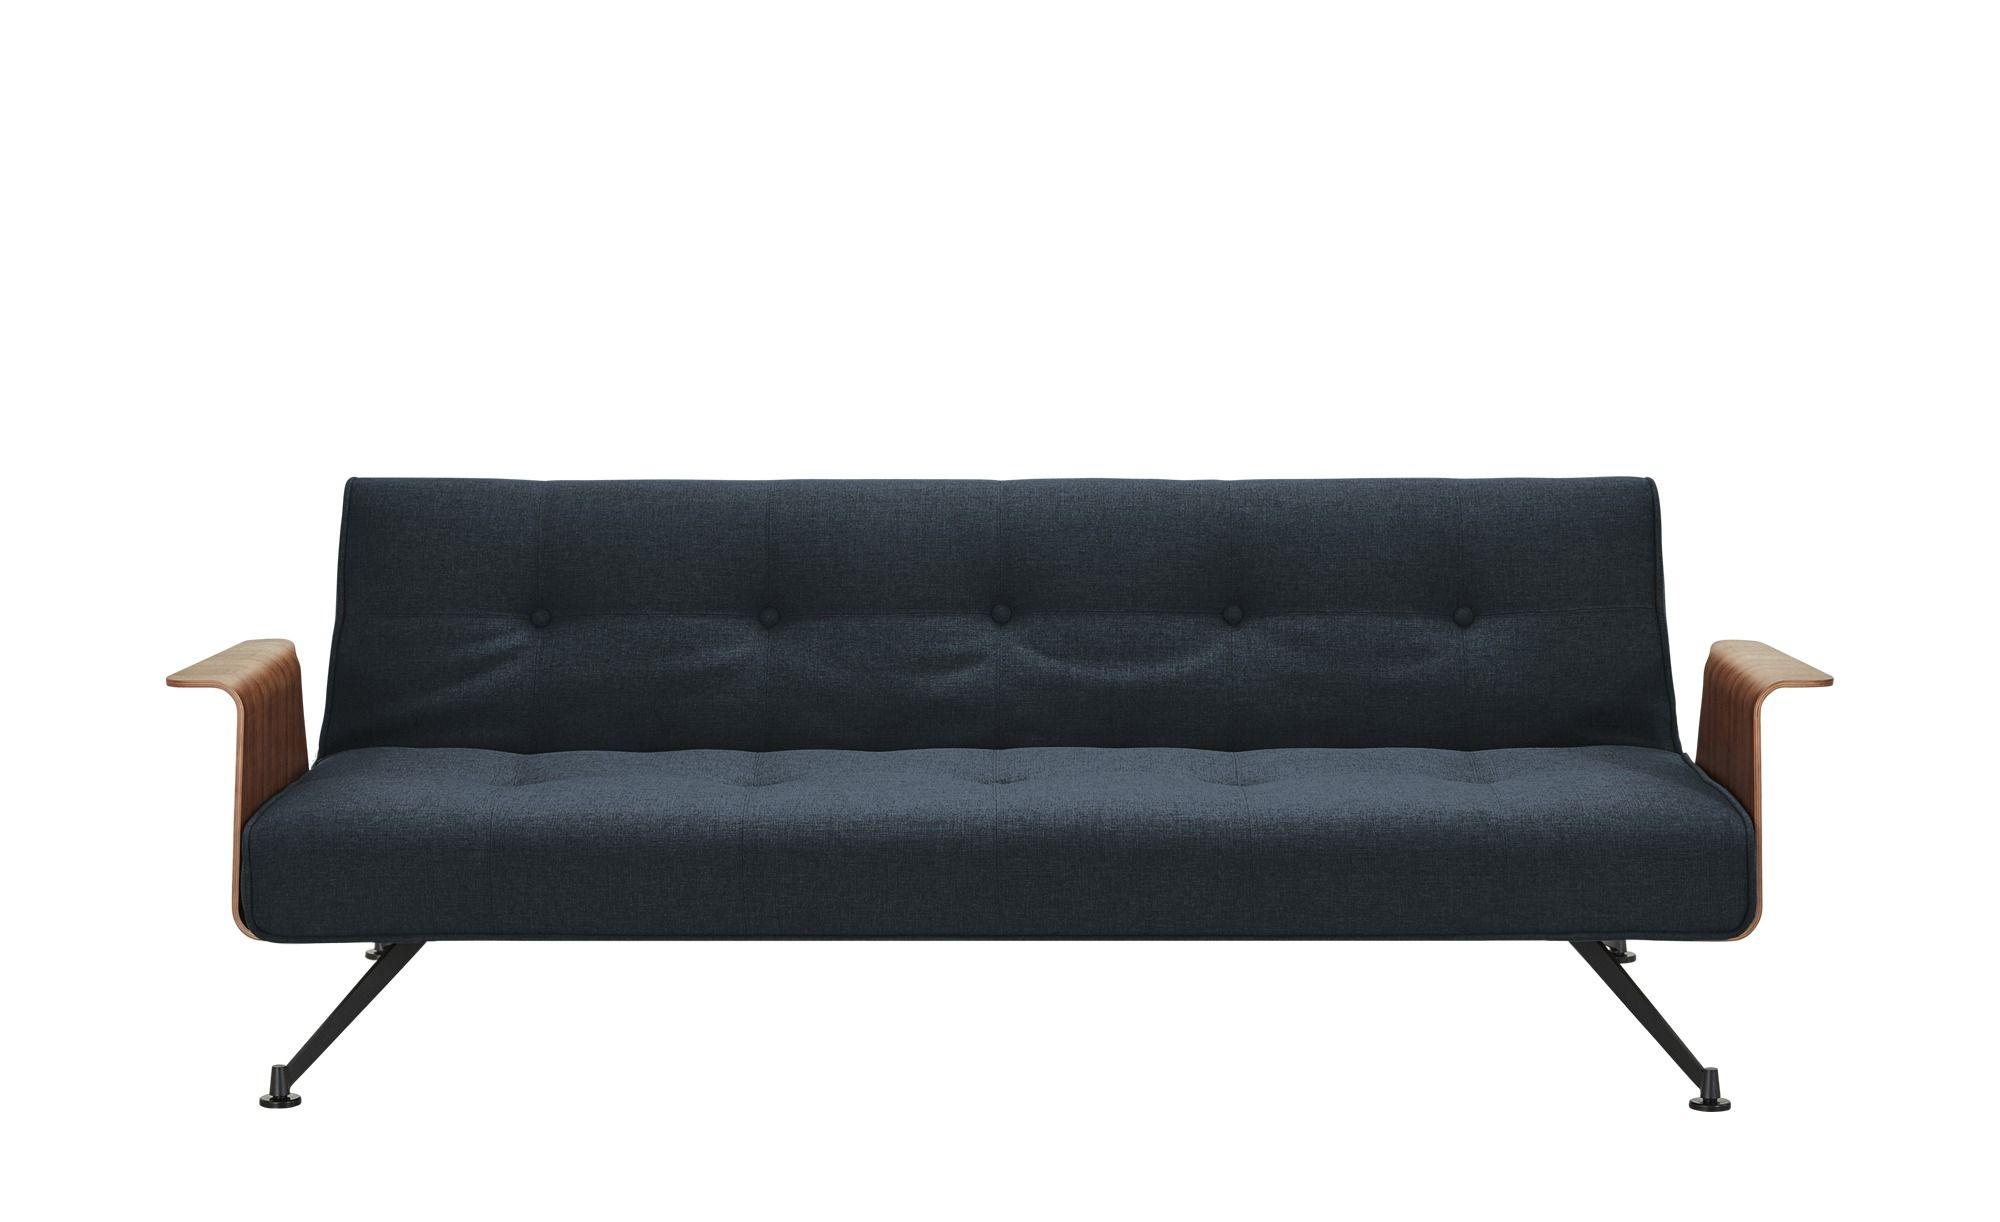 Design Sofa Jazz Gefunden Bei Mobel Hoffner Sofa Big Sofa Kaufen Sofa Design